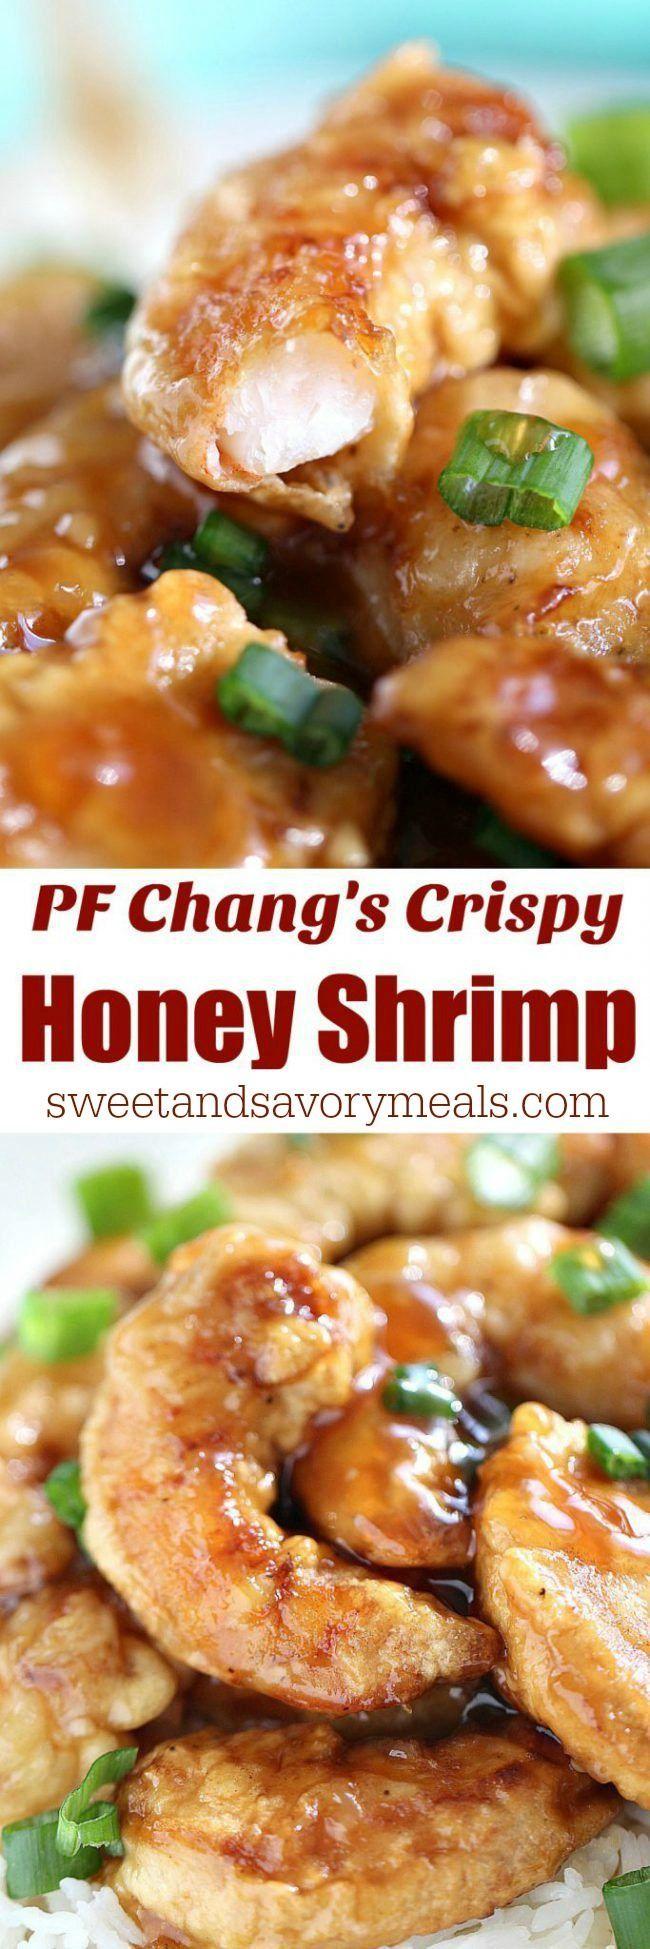 pf chang's crispy honey shrimp copycat - sweet and savory